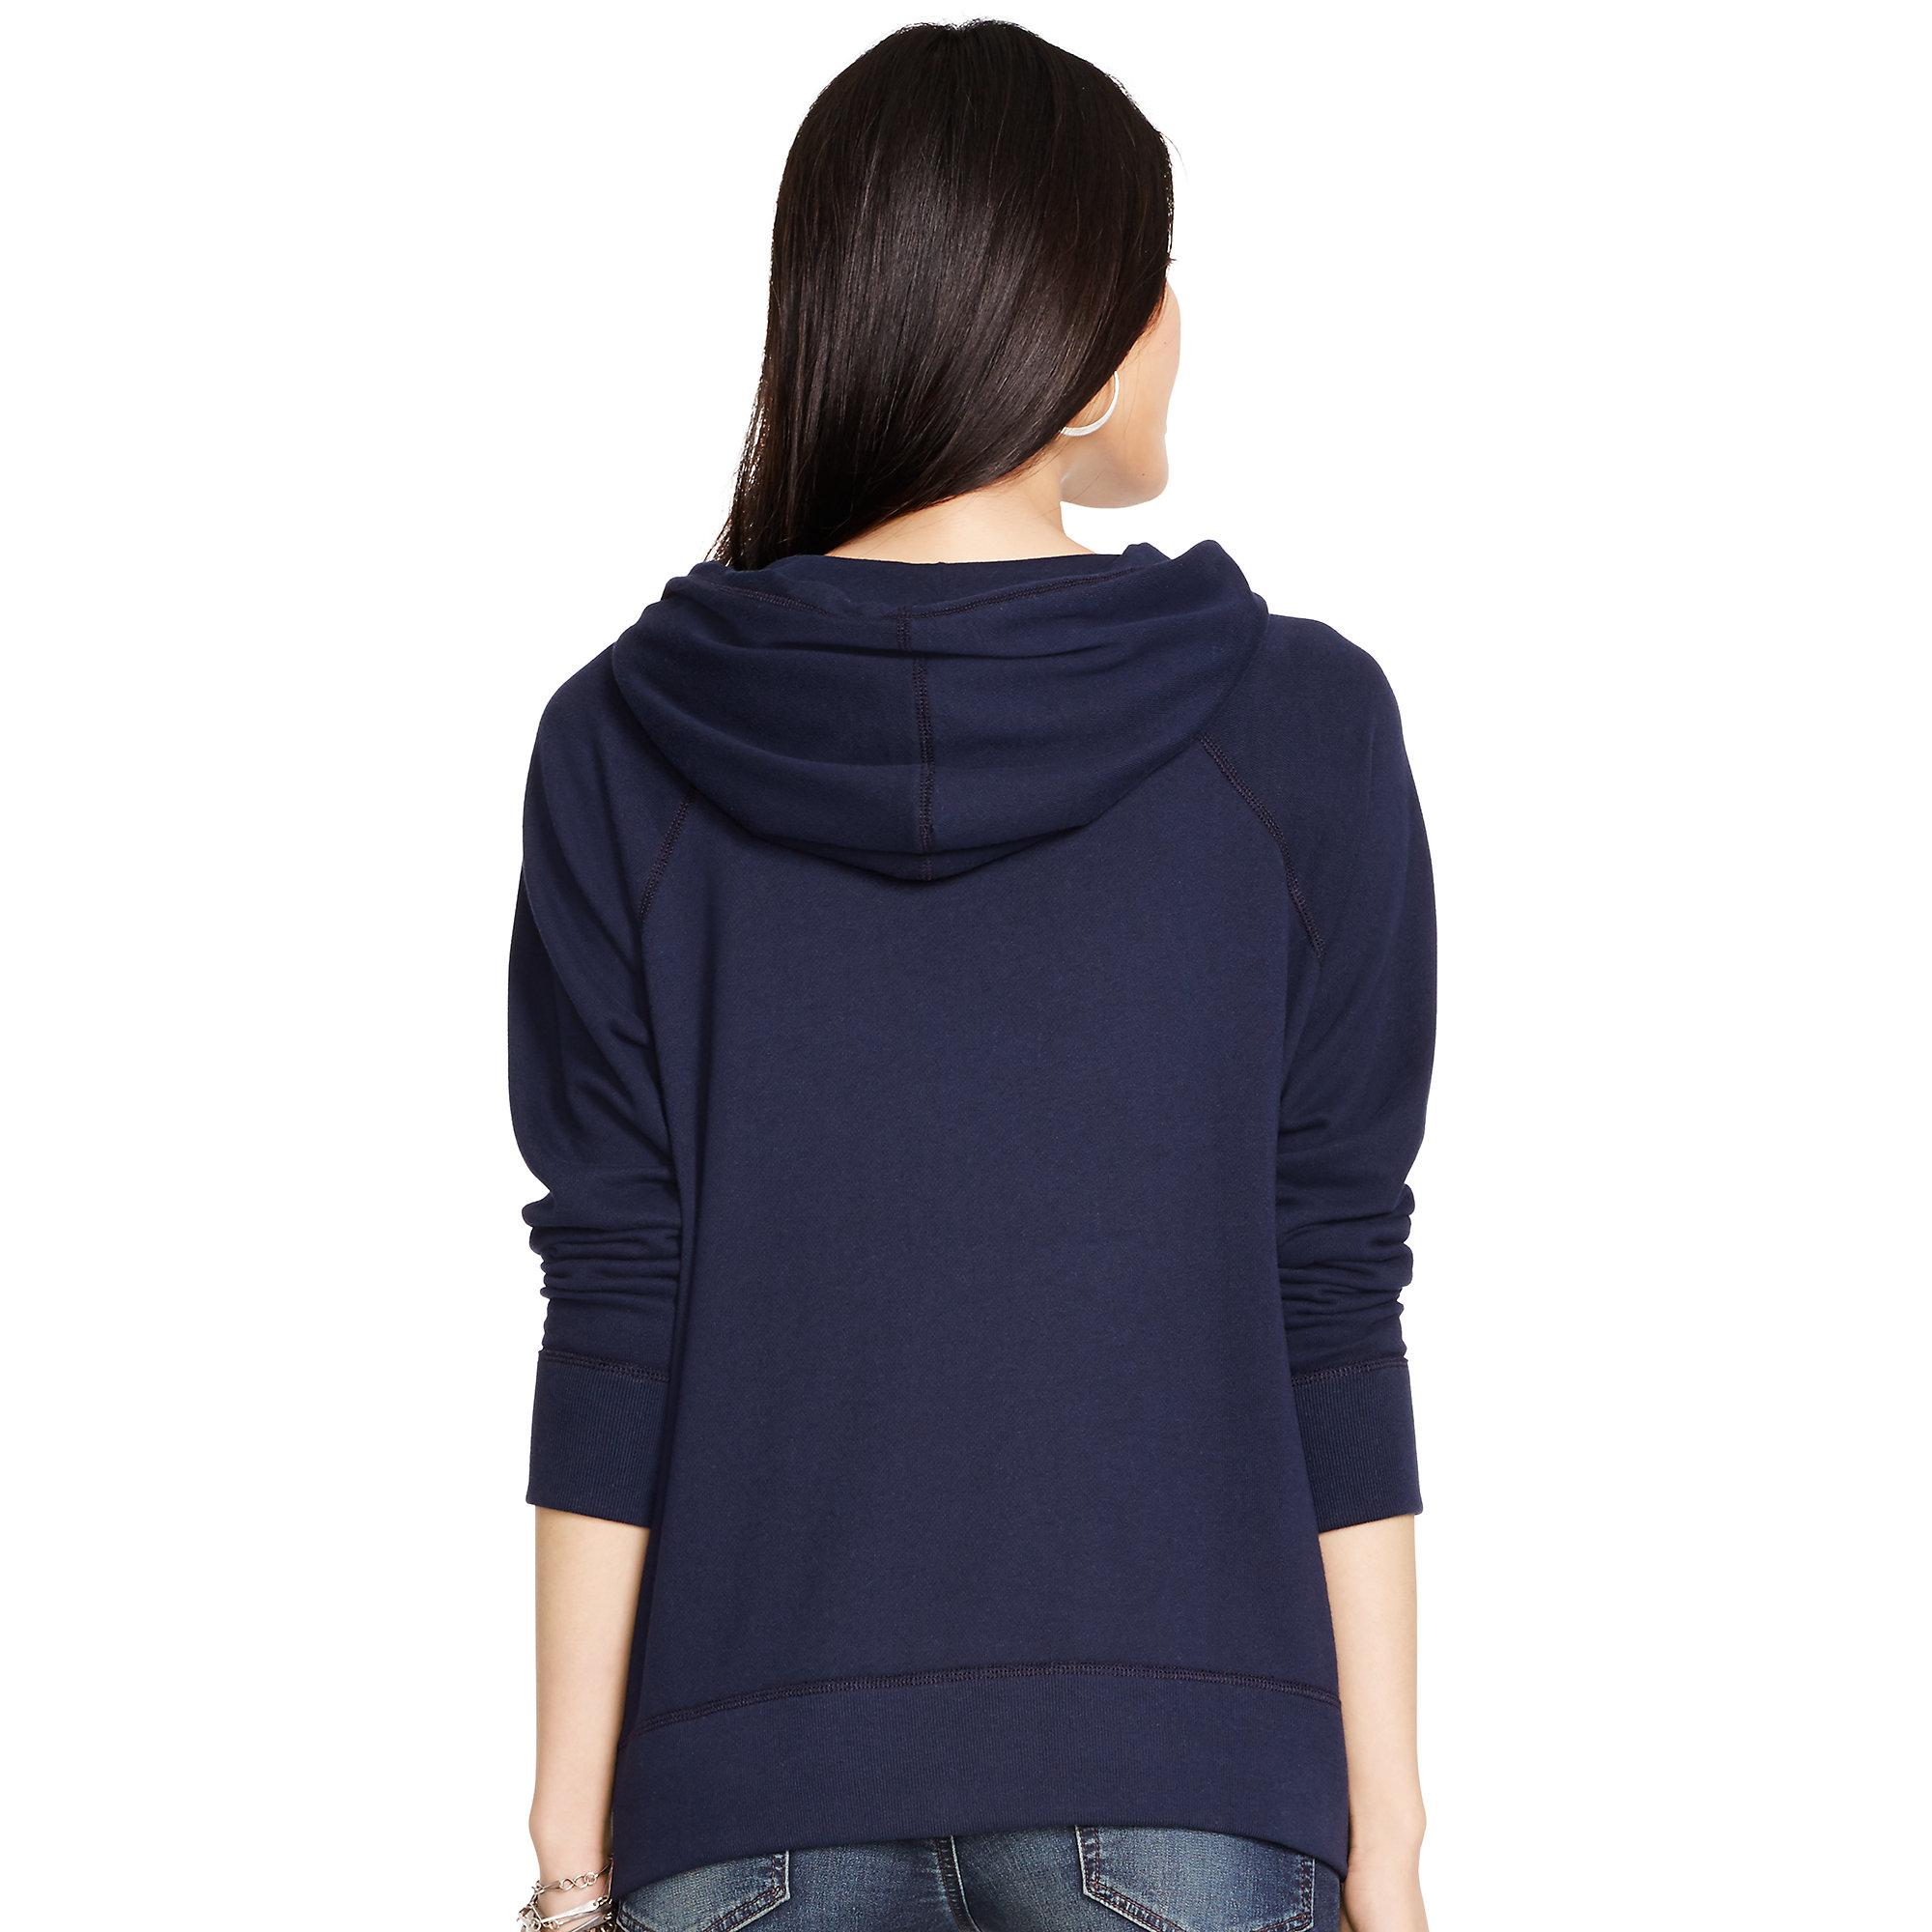 polo ralph lauren cotton blend fleece hoodie in blue lyst. Black Bedroom Furniture Sets. Home Design Ideas